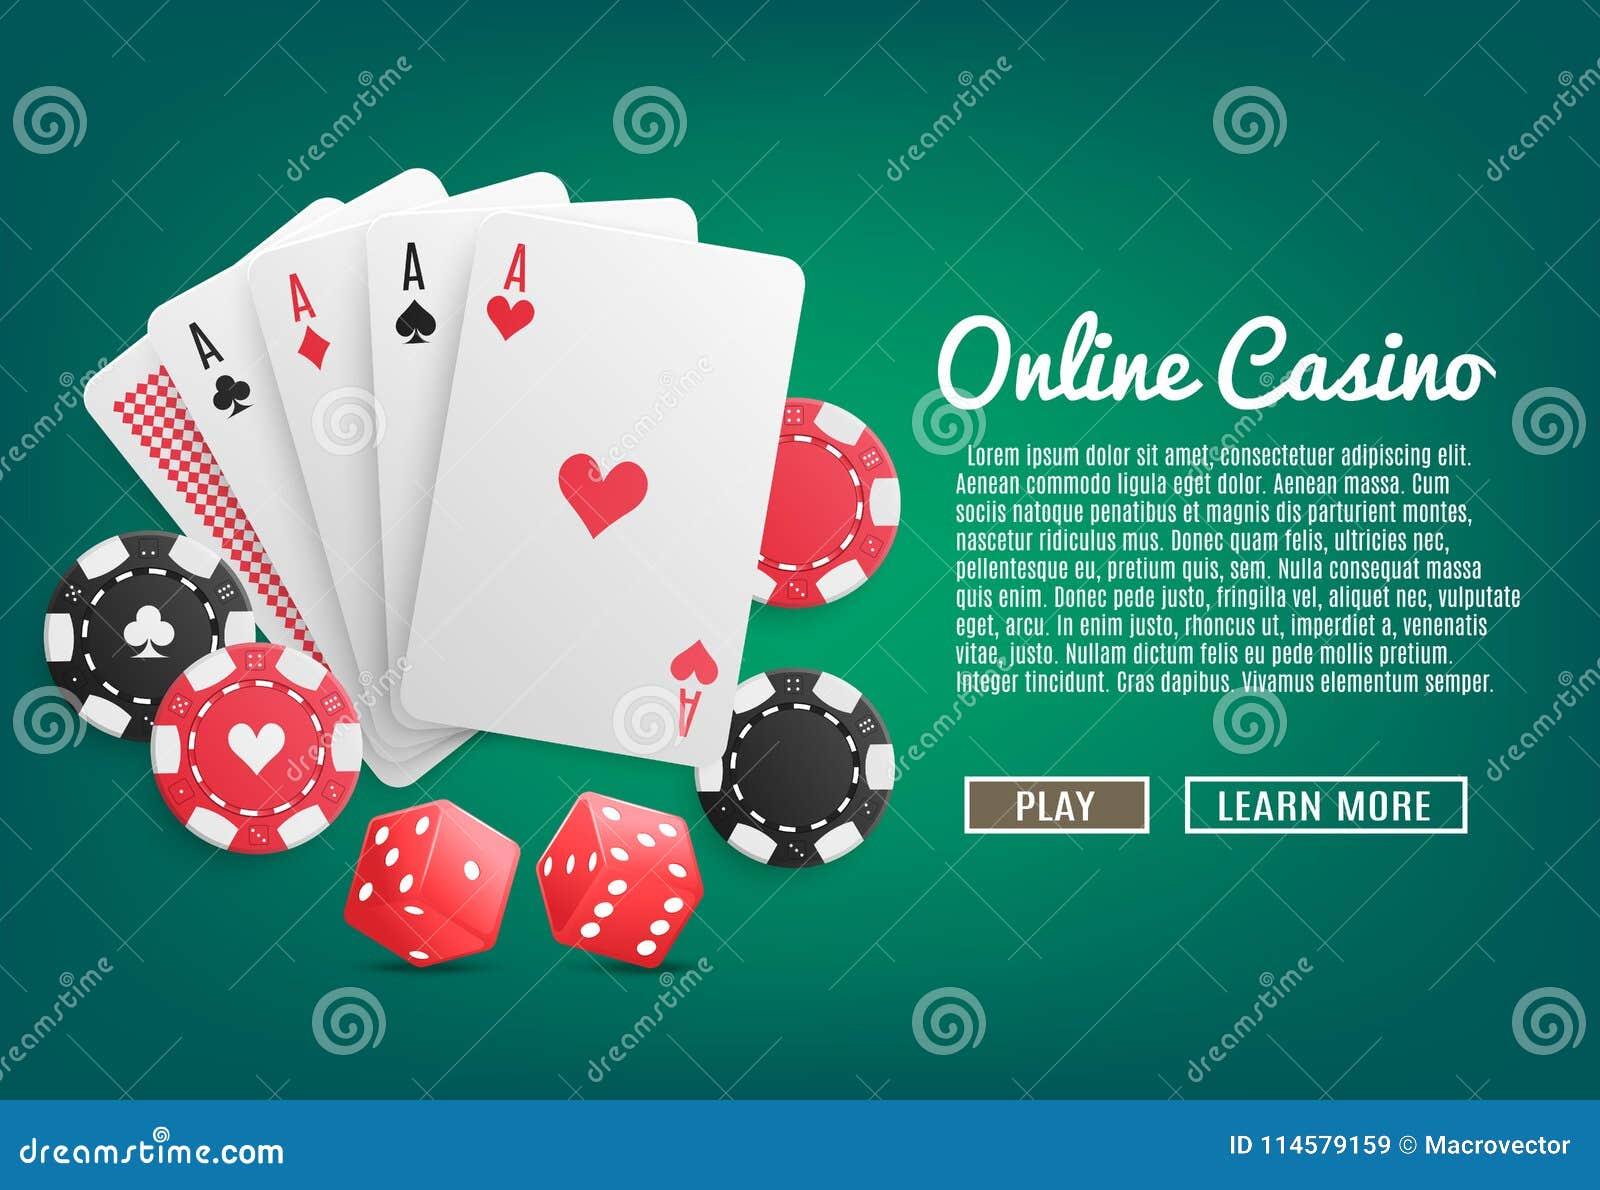 all star slots casino bonus codes